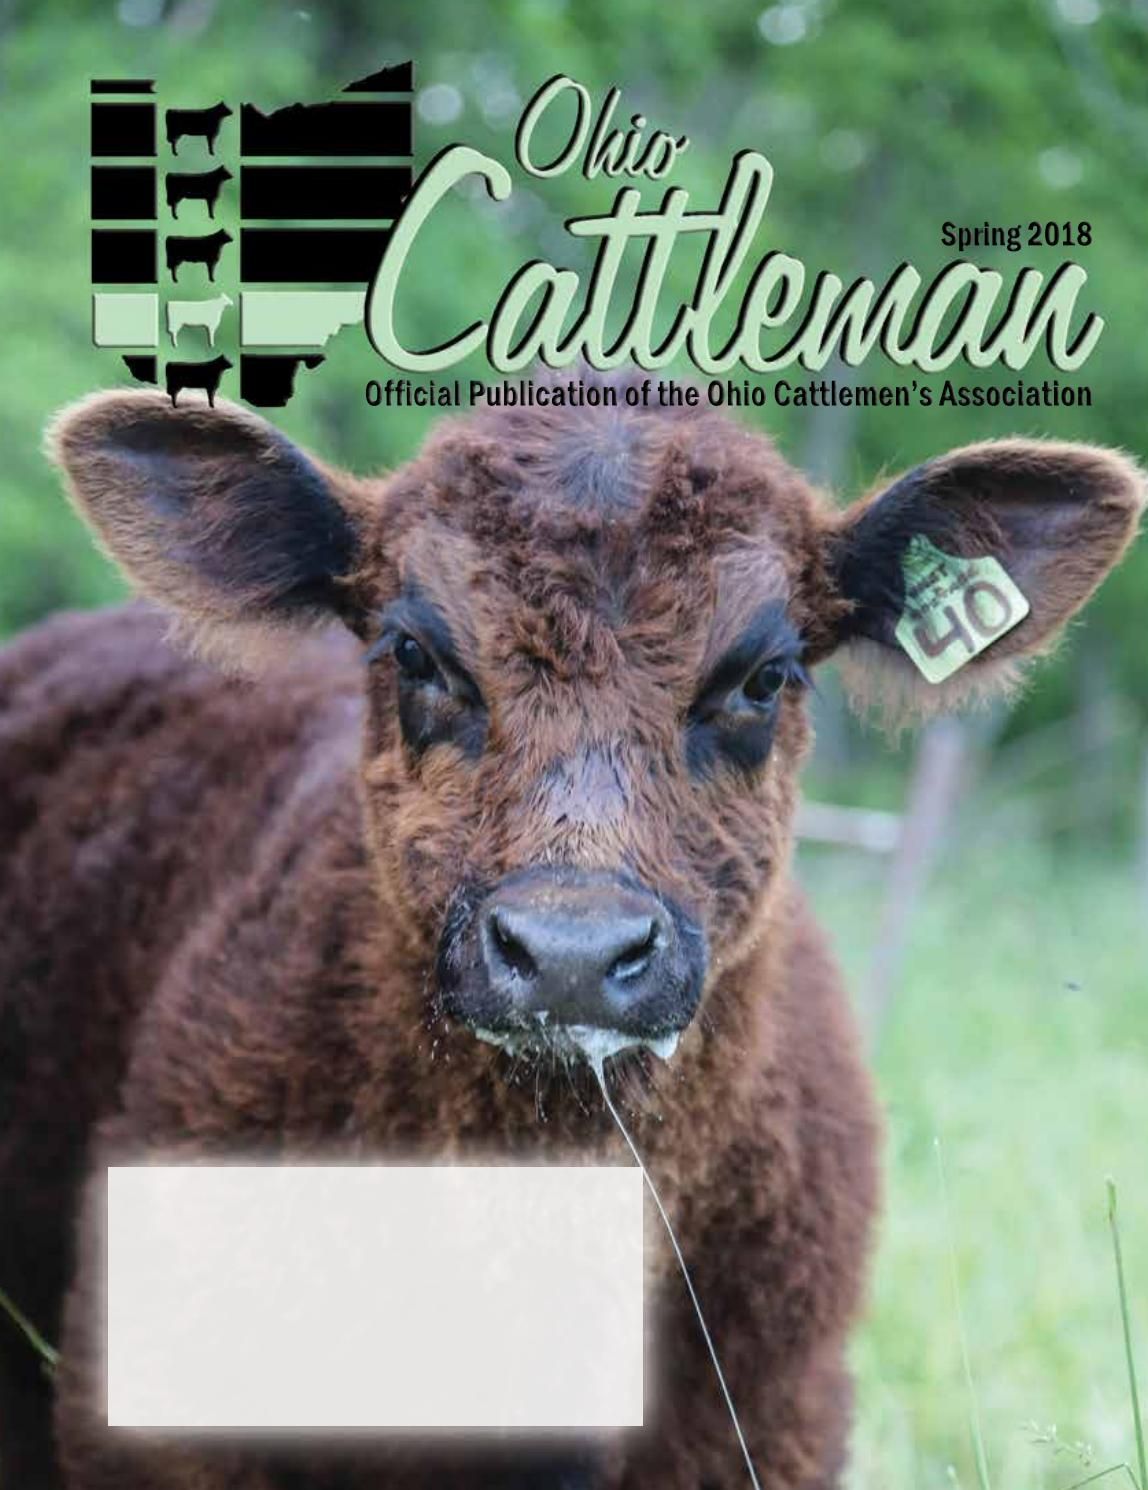 Ohio Cattleman Spring Issue 2018 By Ohio Cattlemen S Association